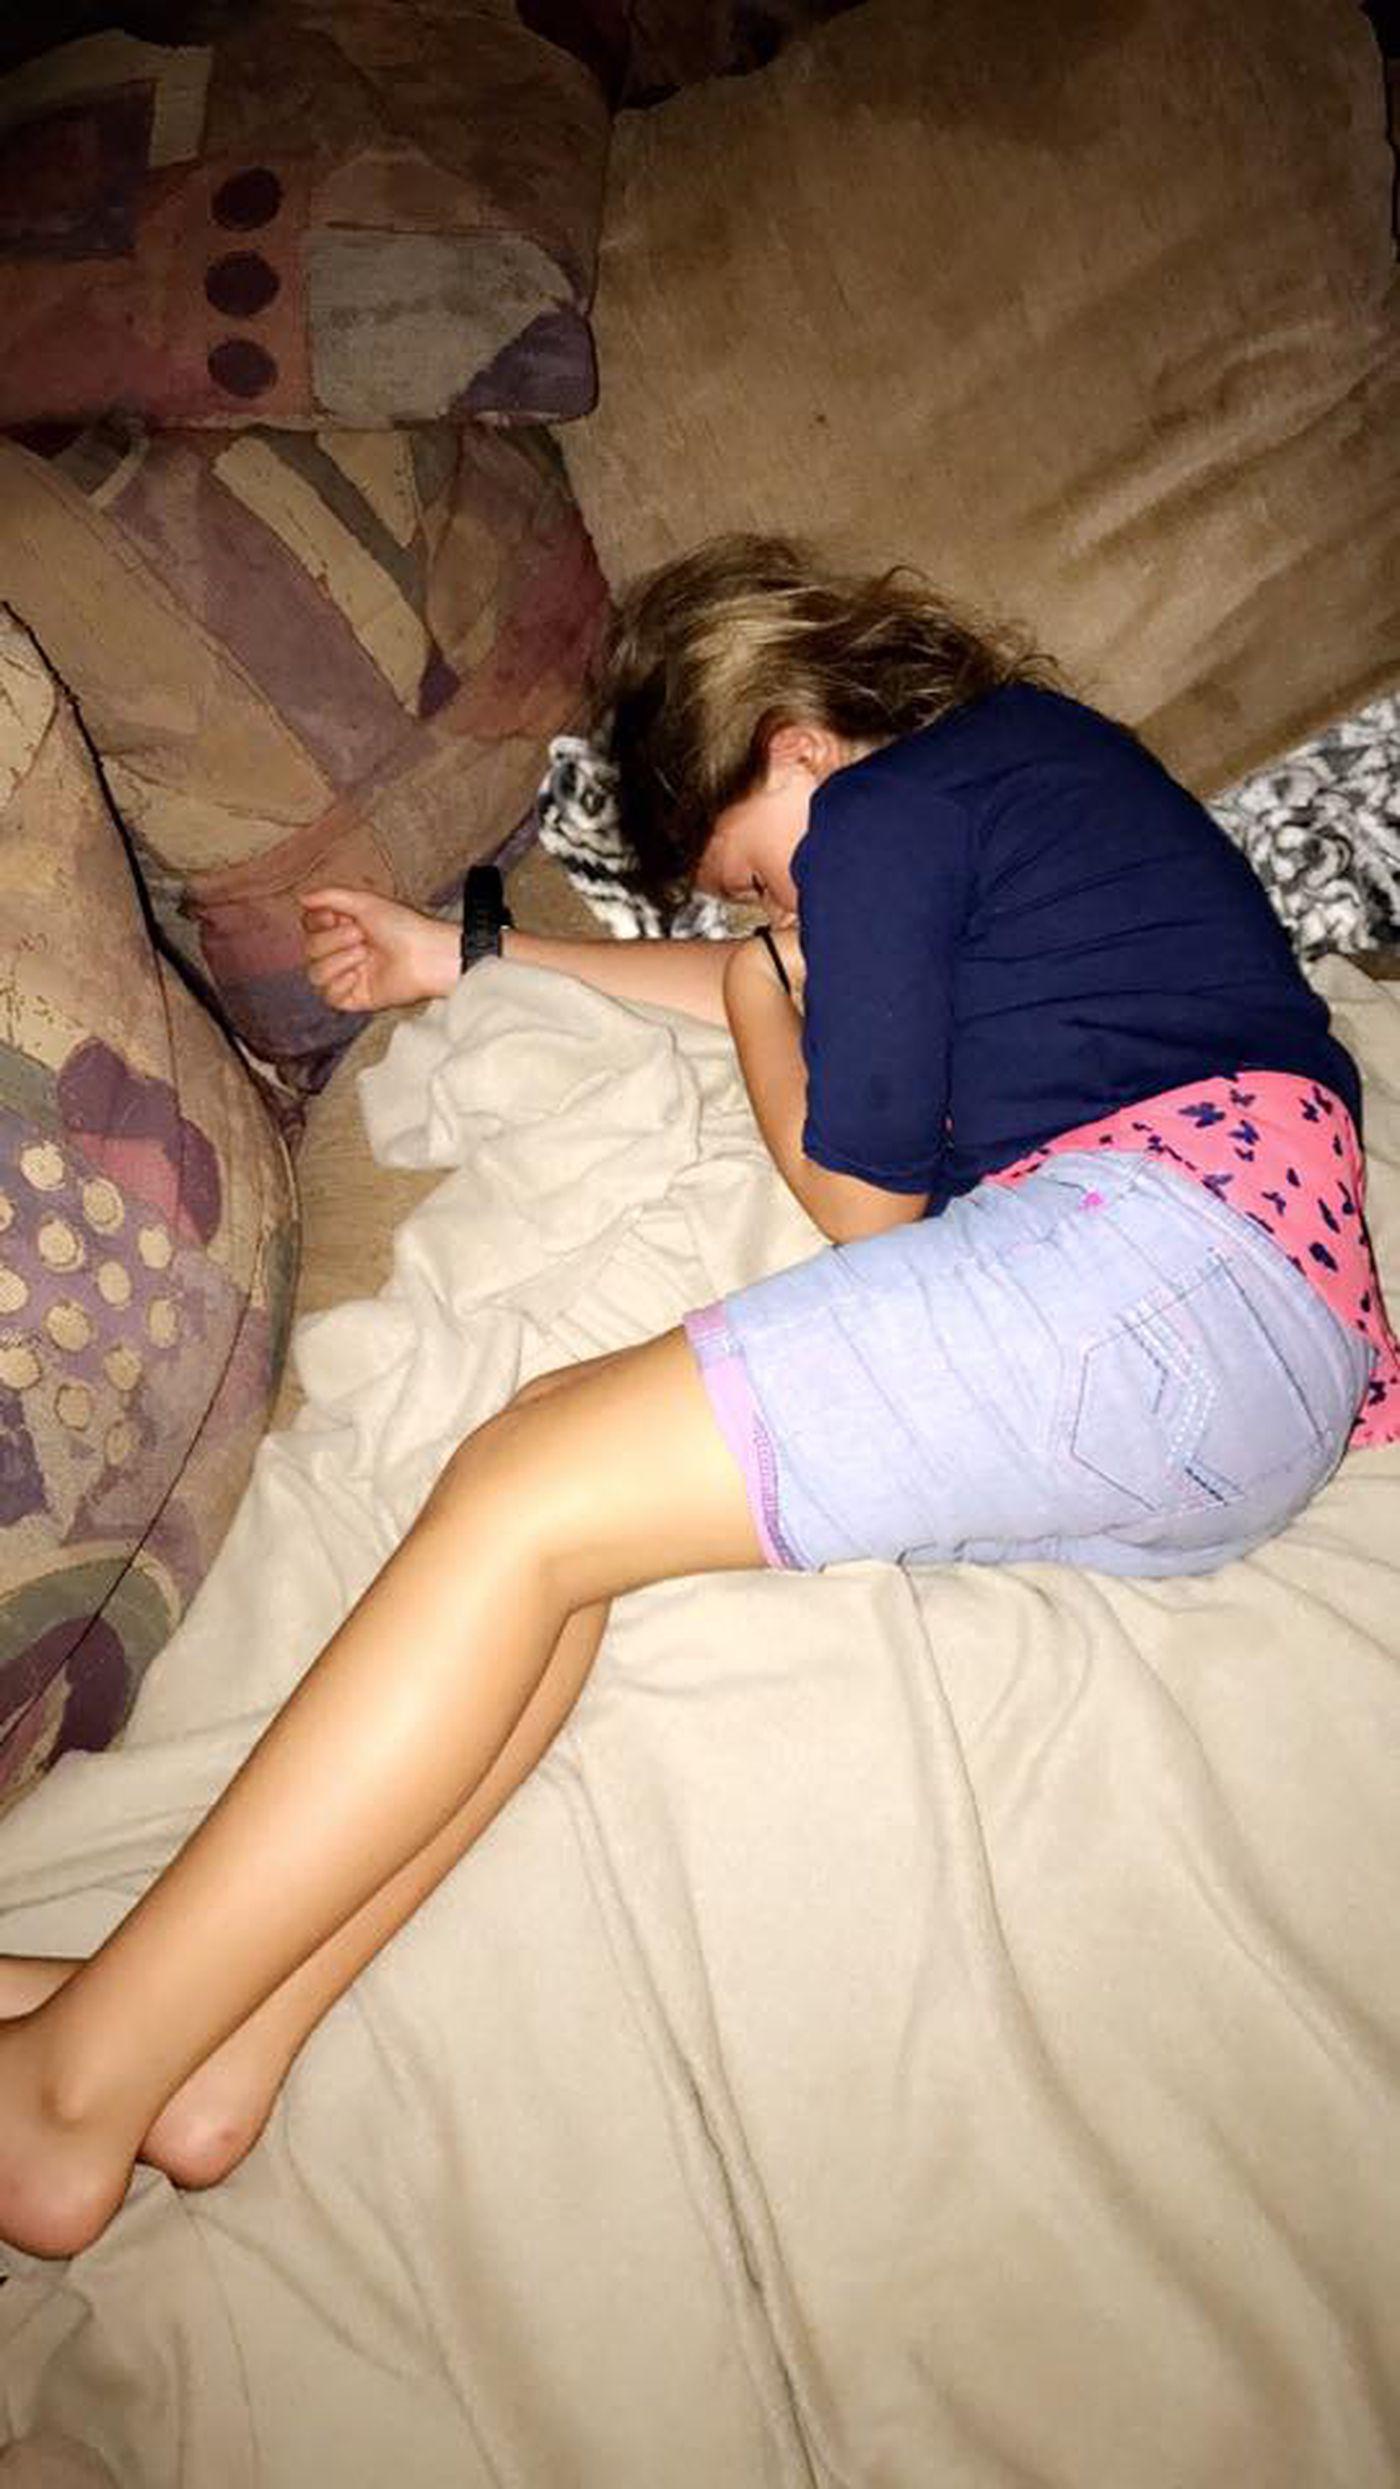 Daughter sleeping porn